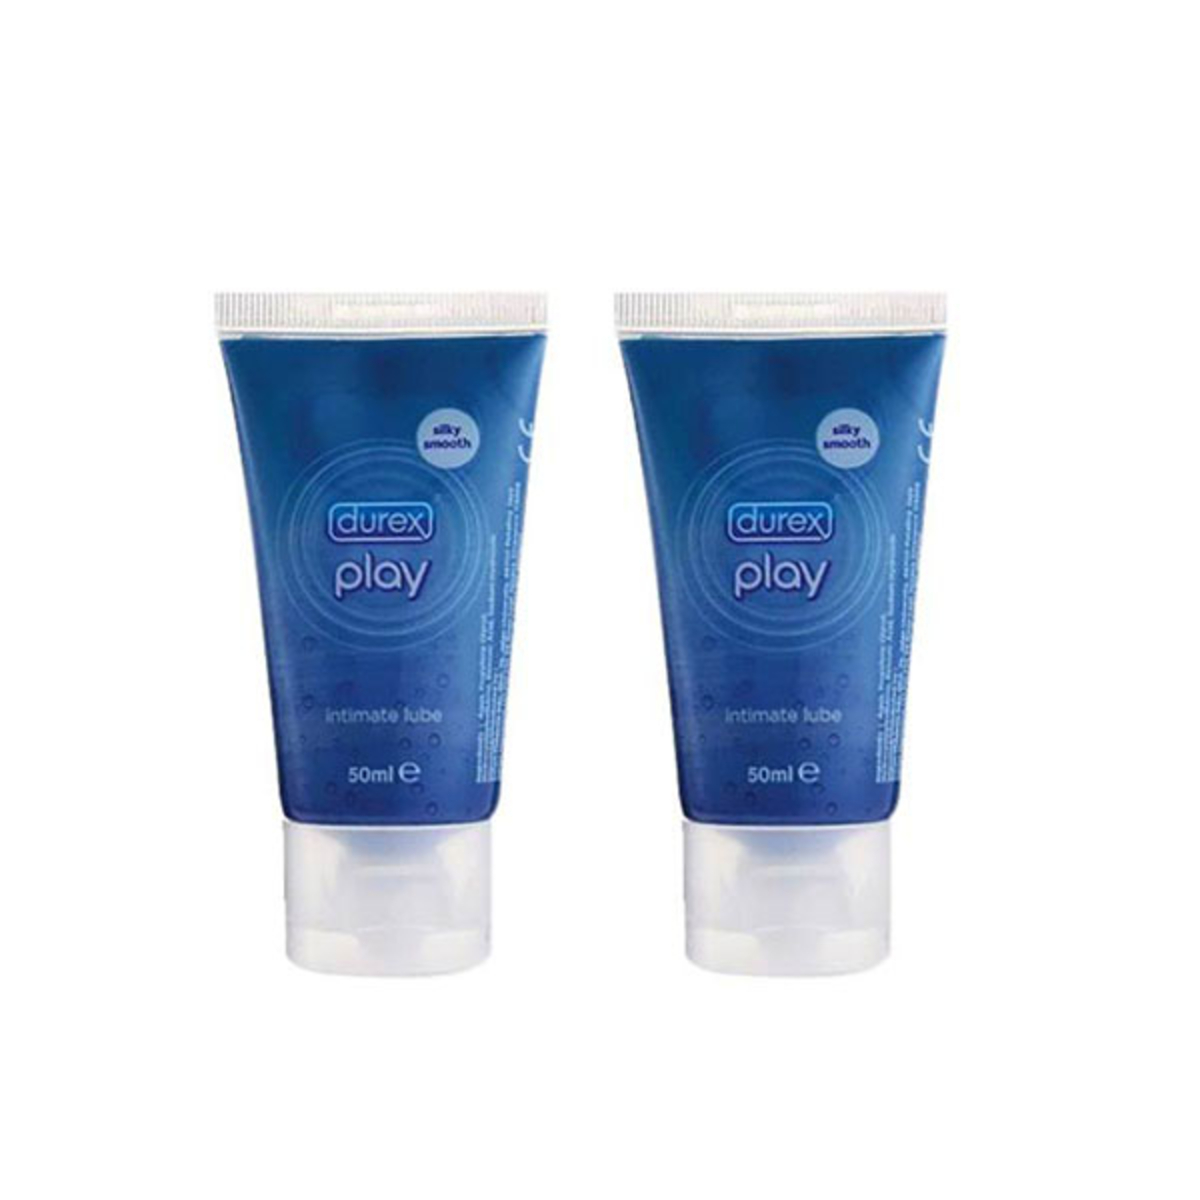 Durex Play Lubricant 50ml X2 Go Shop Intimate Lube 100 Ml